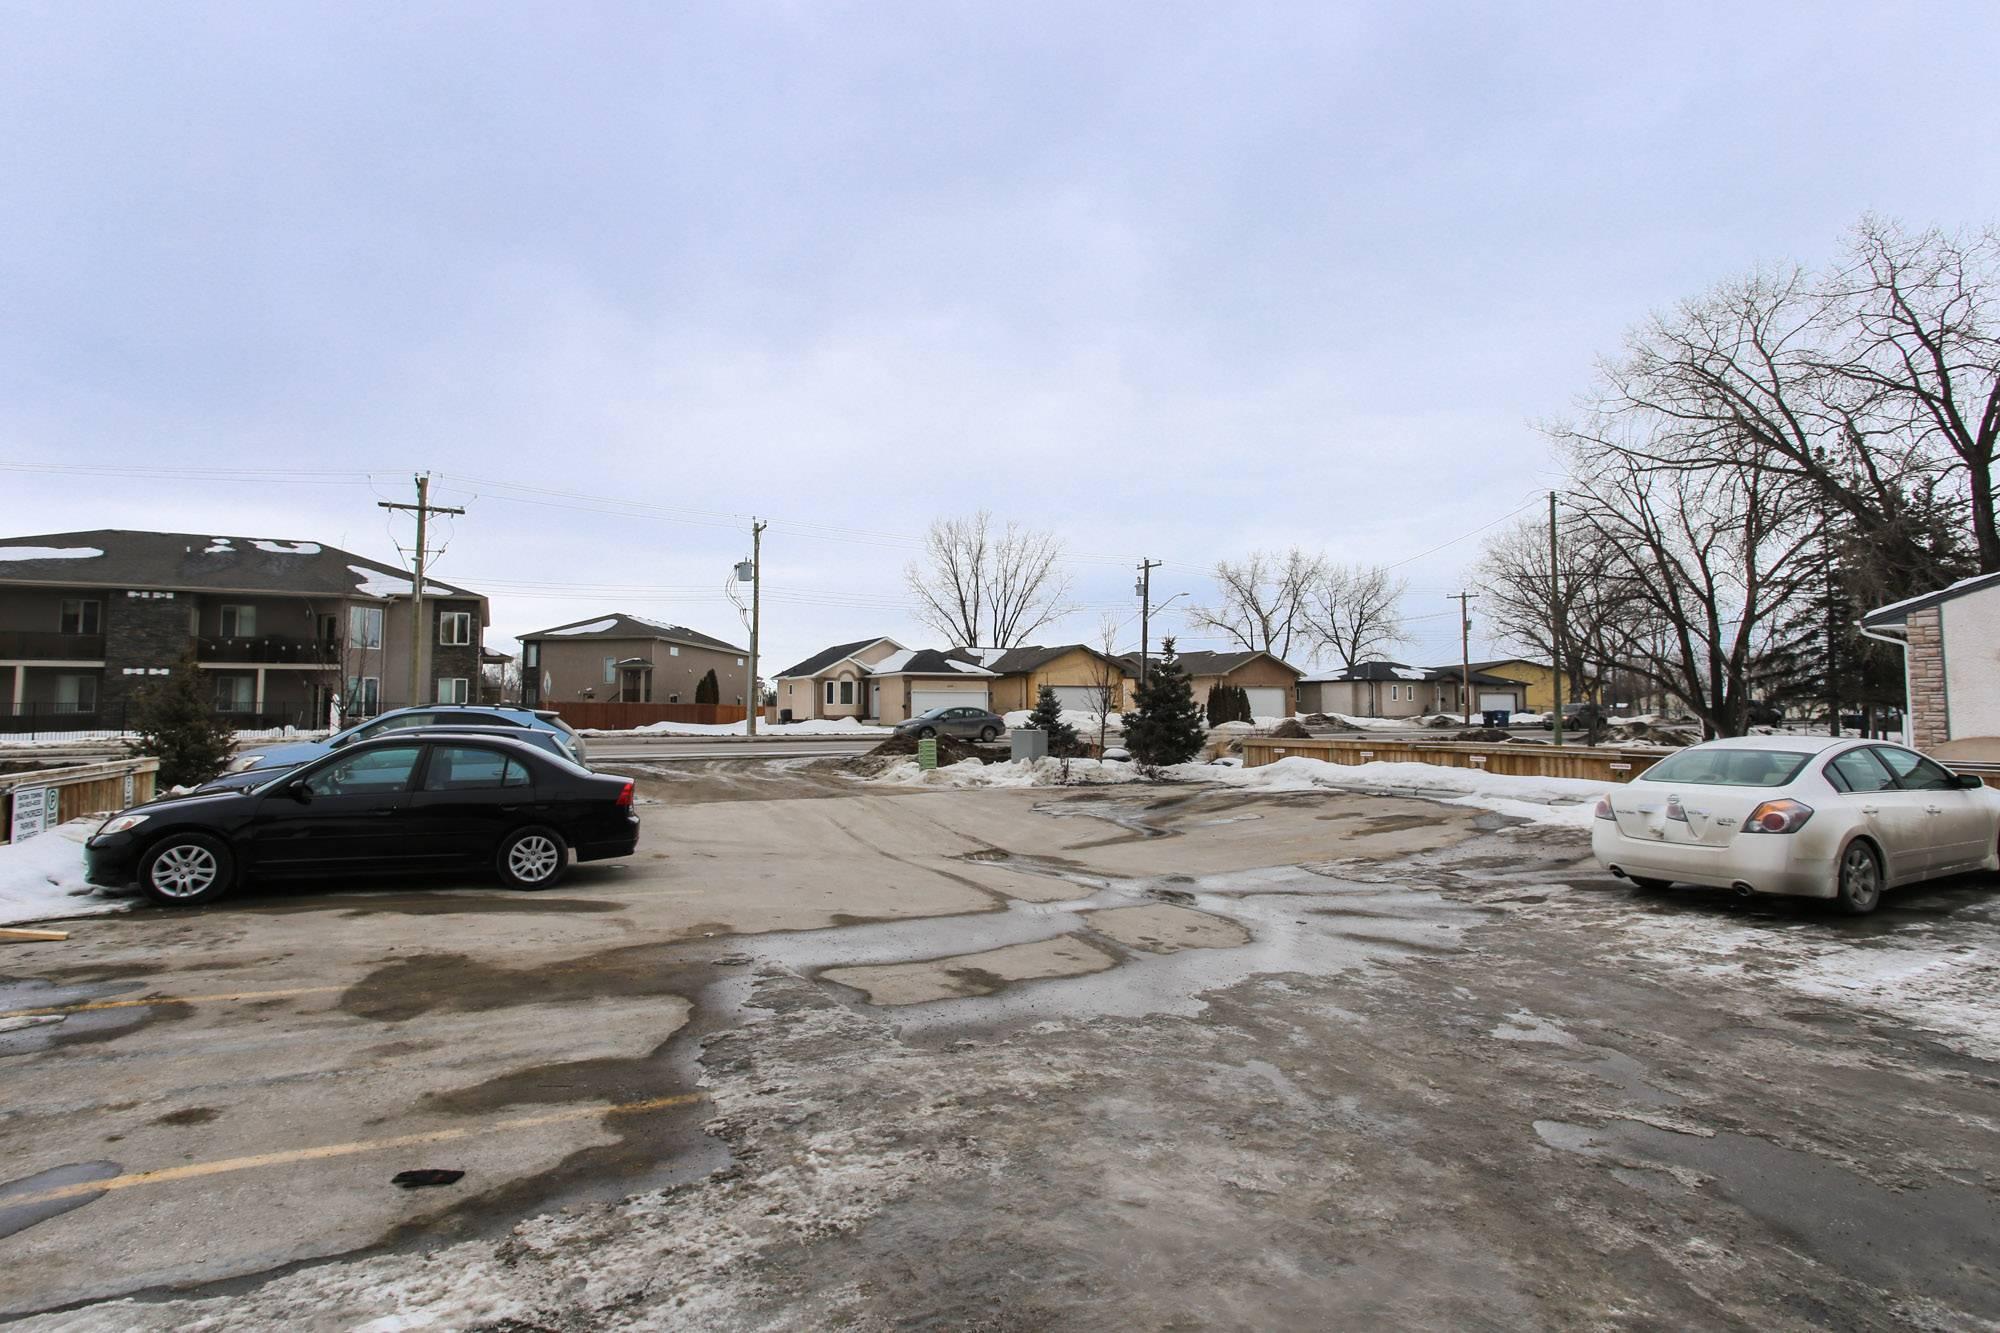 12-226 Grassie Blvd, Winnipeg, Manitoba  R2G 2L6 - Photo 28 - 1900390